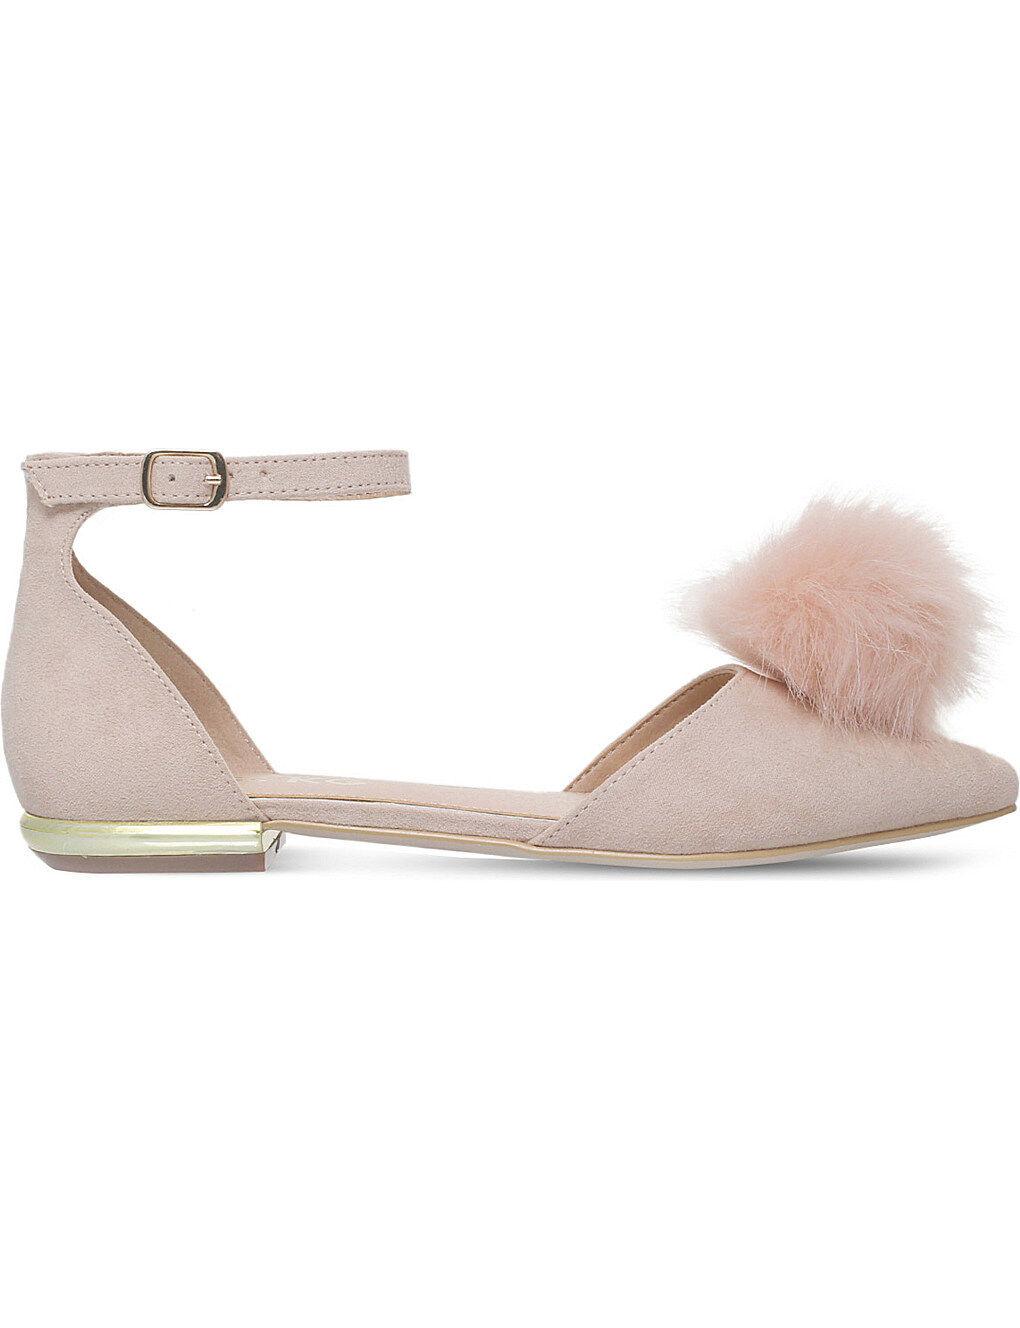 Miss KG goldie Pom Pom Flat shoes Nude LN086 NN 05